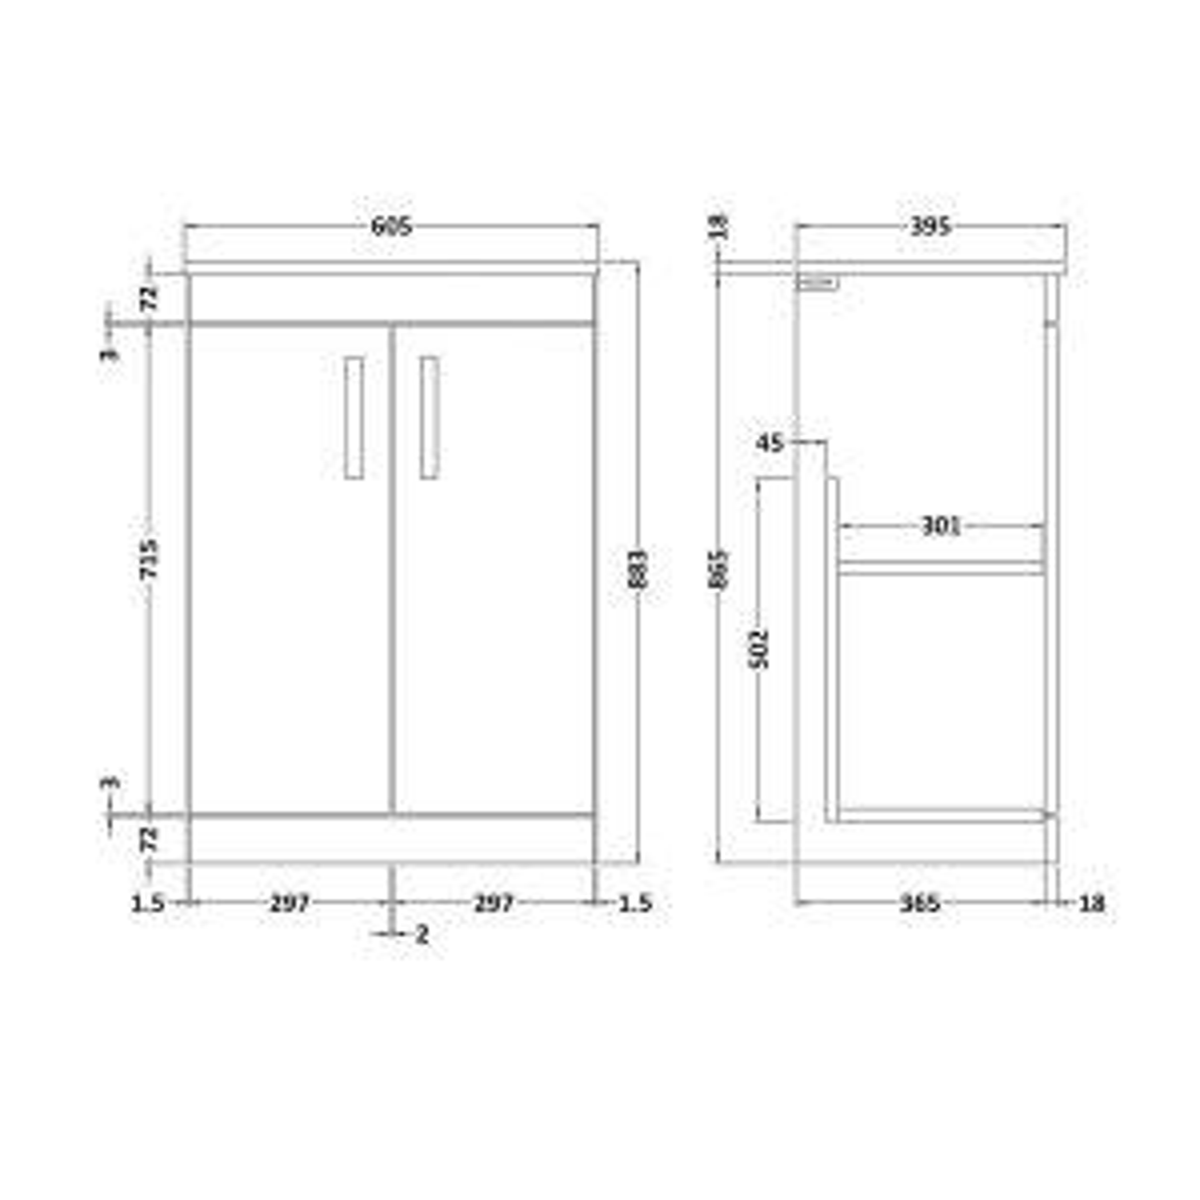 Nuie Athena Gloss Grey Mist 2 Door Floor Standing Vanity Unit with 18mm Profile Basin 600mm Line Drawing